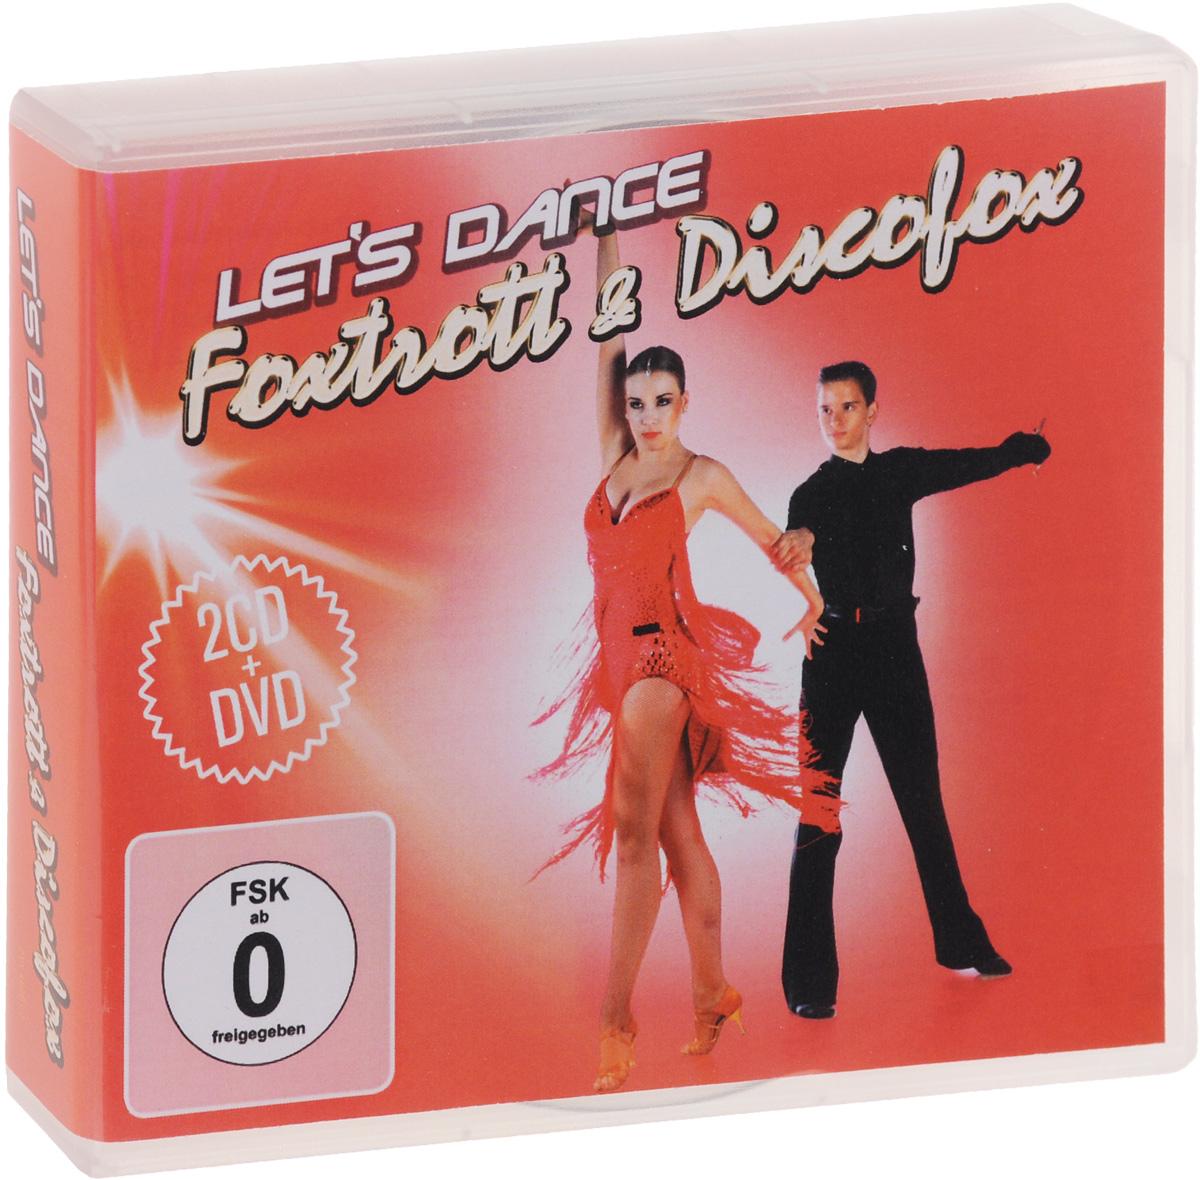 Let's Dance. Foxtrott & Discofox (2 CD + DVD) сапоги quelle der spur 1013540